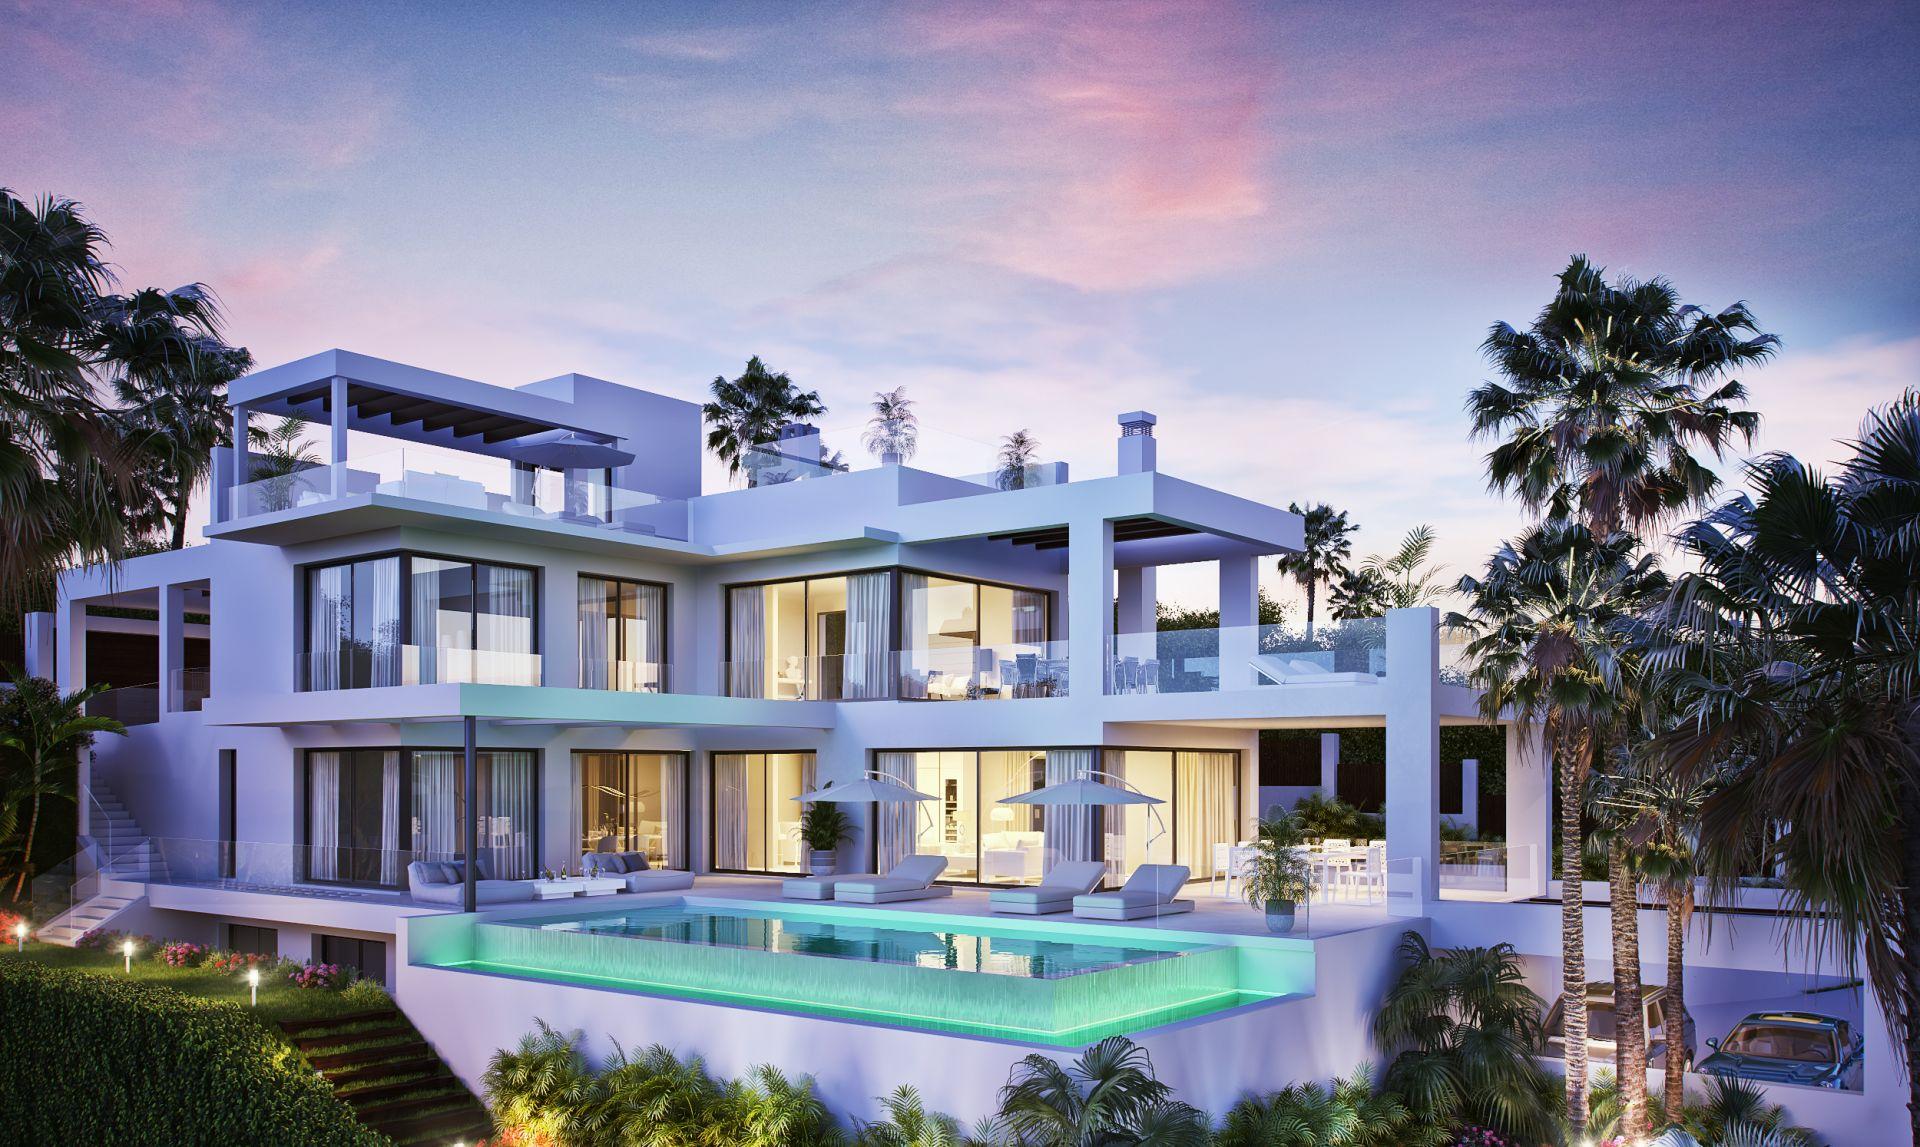 The View Luxury Villas , The View, Estepona - Development in The View, Estepona | Christie's International Real Estate